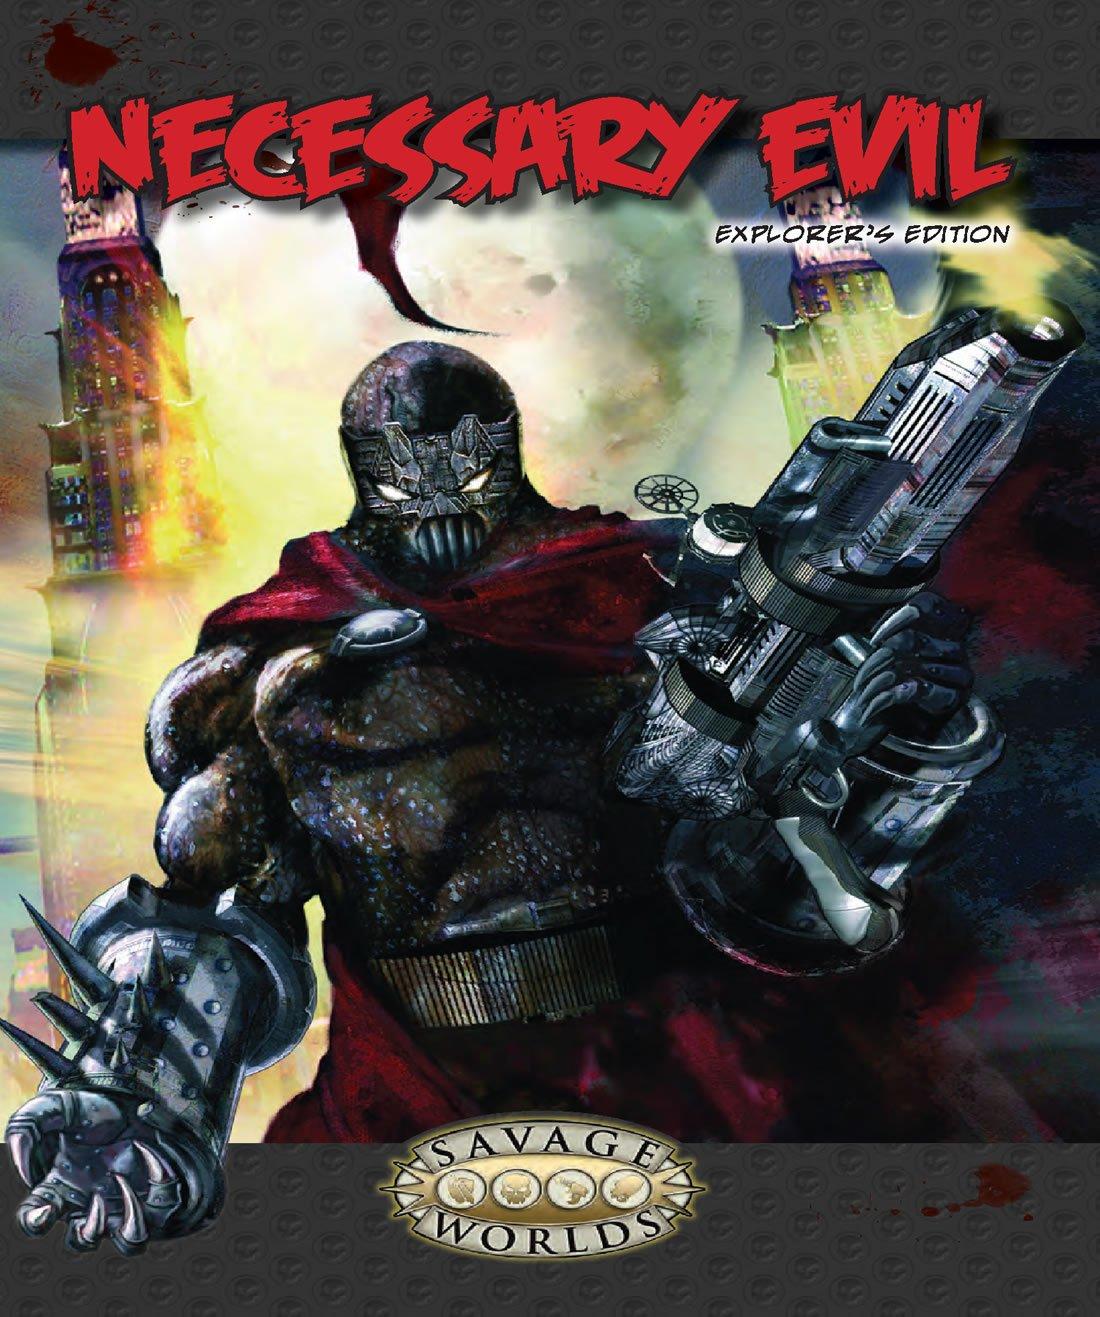 Necessary Evil: Explorer's Edition